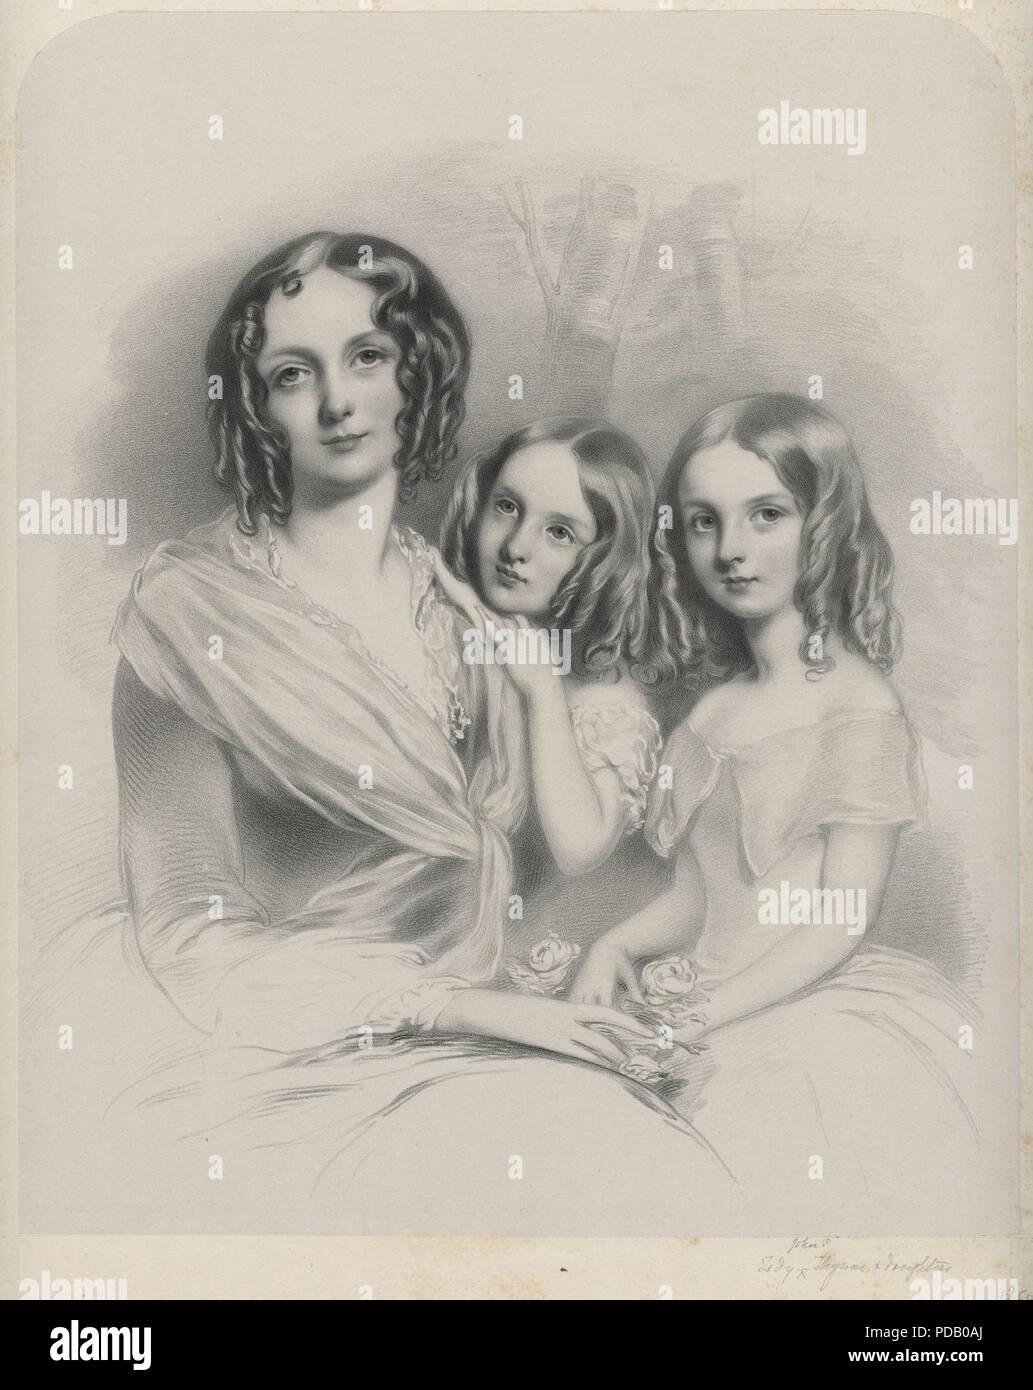 Anna Constantia (née Beresford), Lady Thynne; Selina Thynne; Emily Thynne by Richard James Lane. - Stock Image